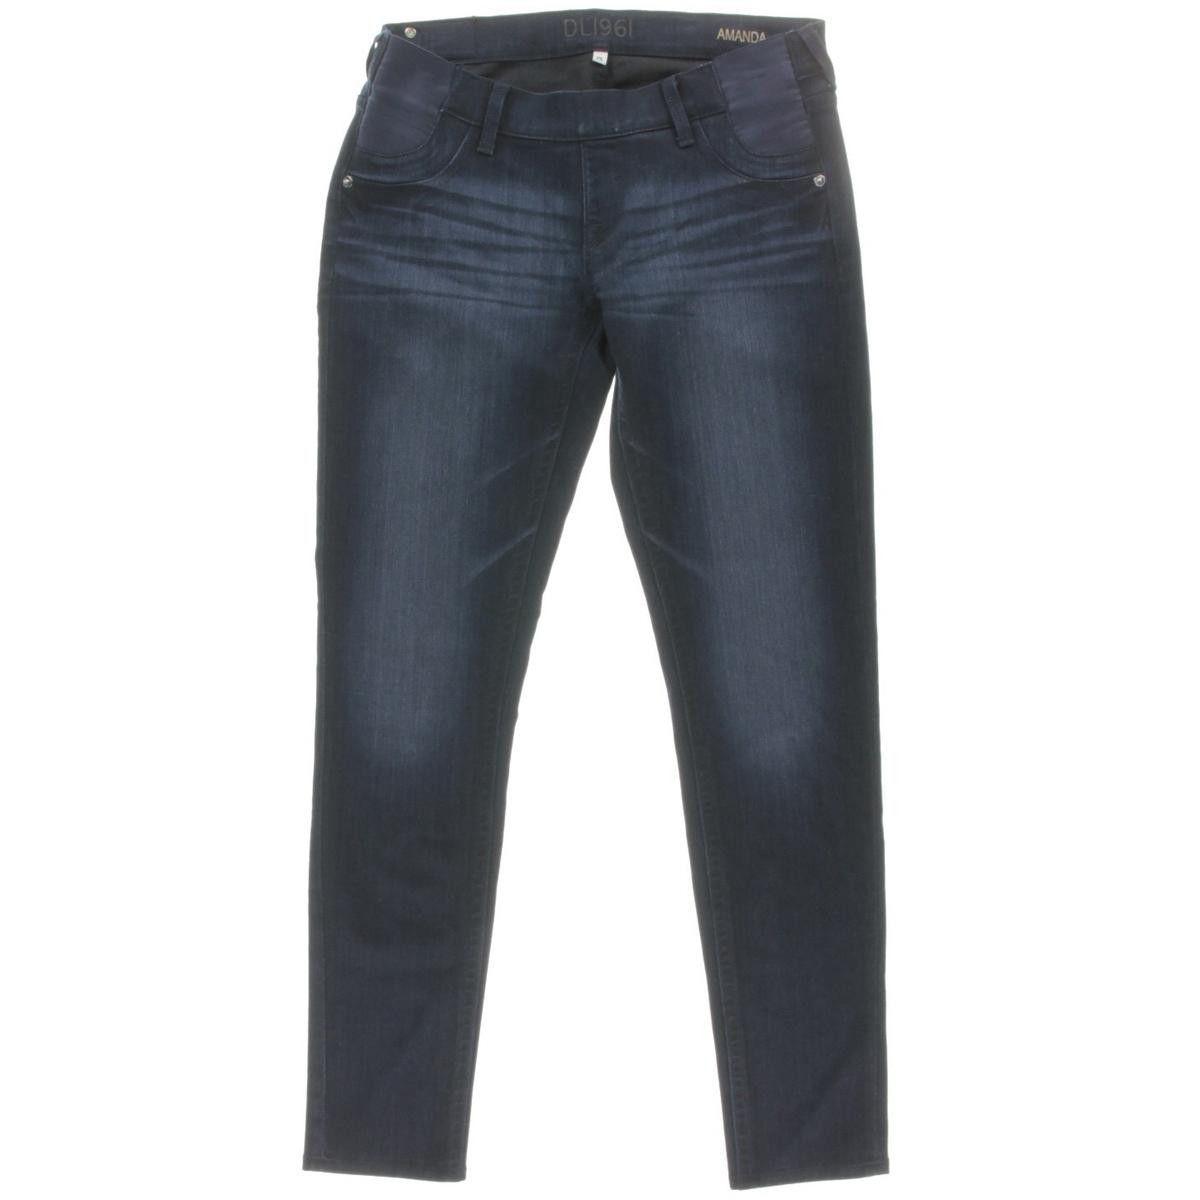 DL1961 Womens Amanda Maternity Whisker Wash Skinny Jeans